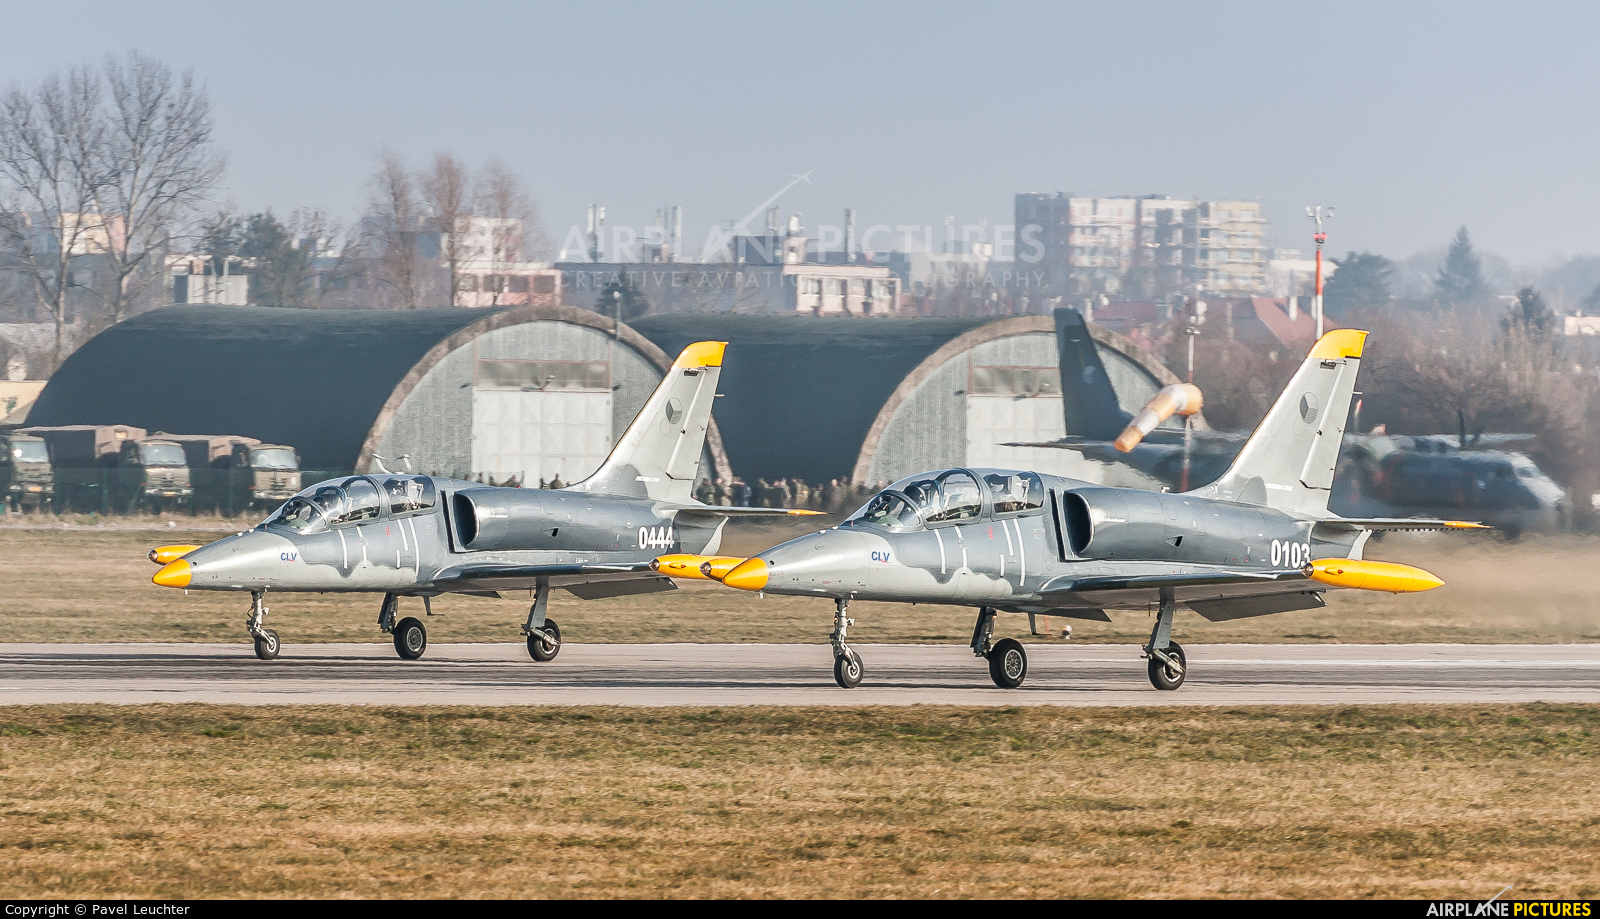 Czech - Air Force 0444 aircraft at Pardubice